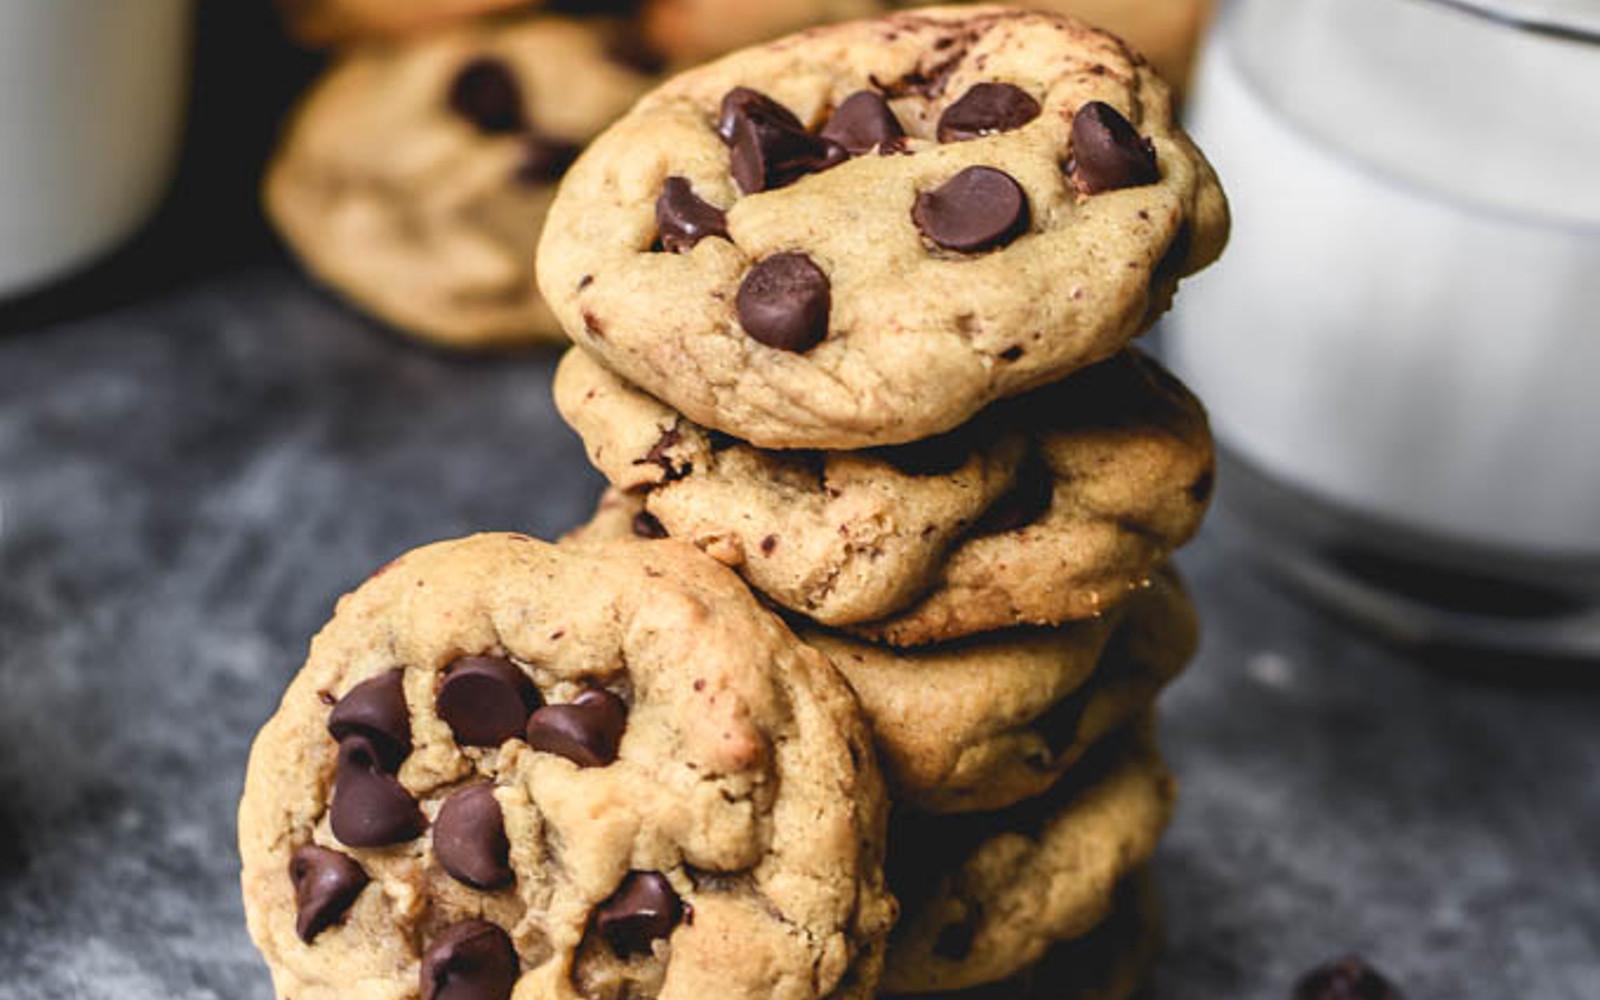 Vegan, Gluten-Free Almond Flour Chocolate Chip Cookies with dairy-free milk